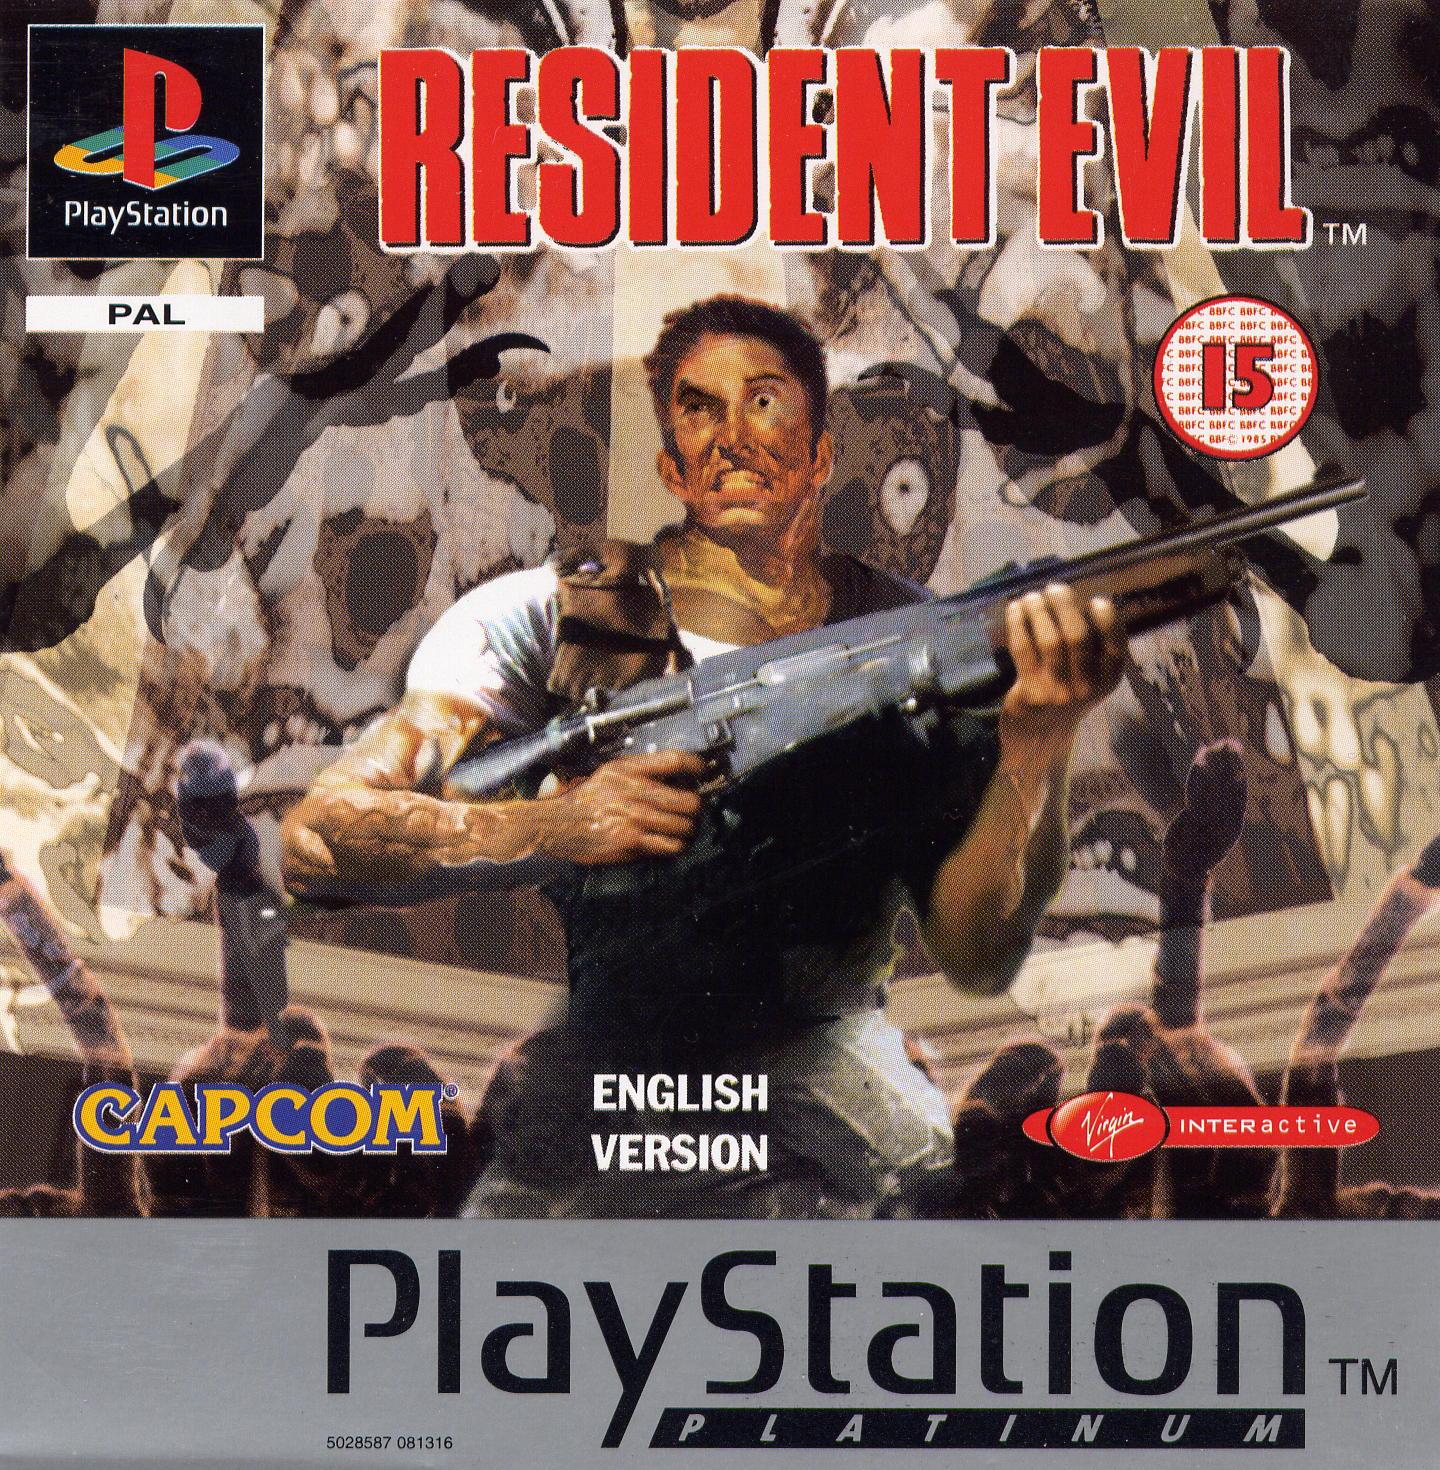 Imagen de la Portada del Resident Evil para PlayStation (1) en 1996